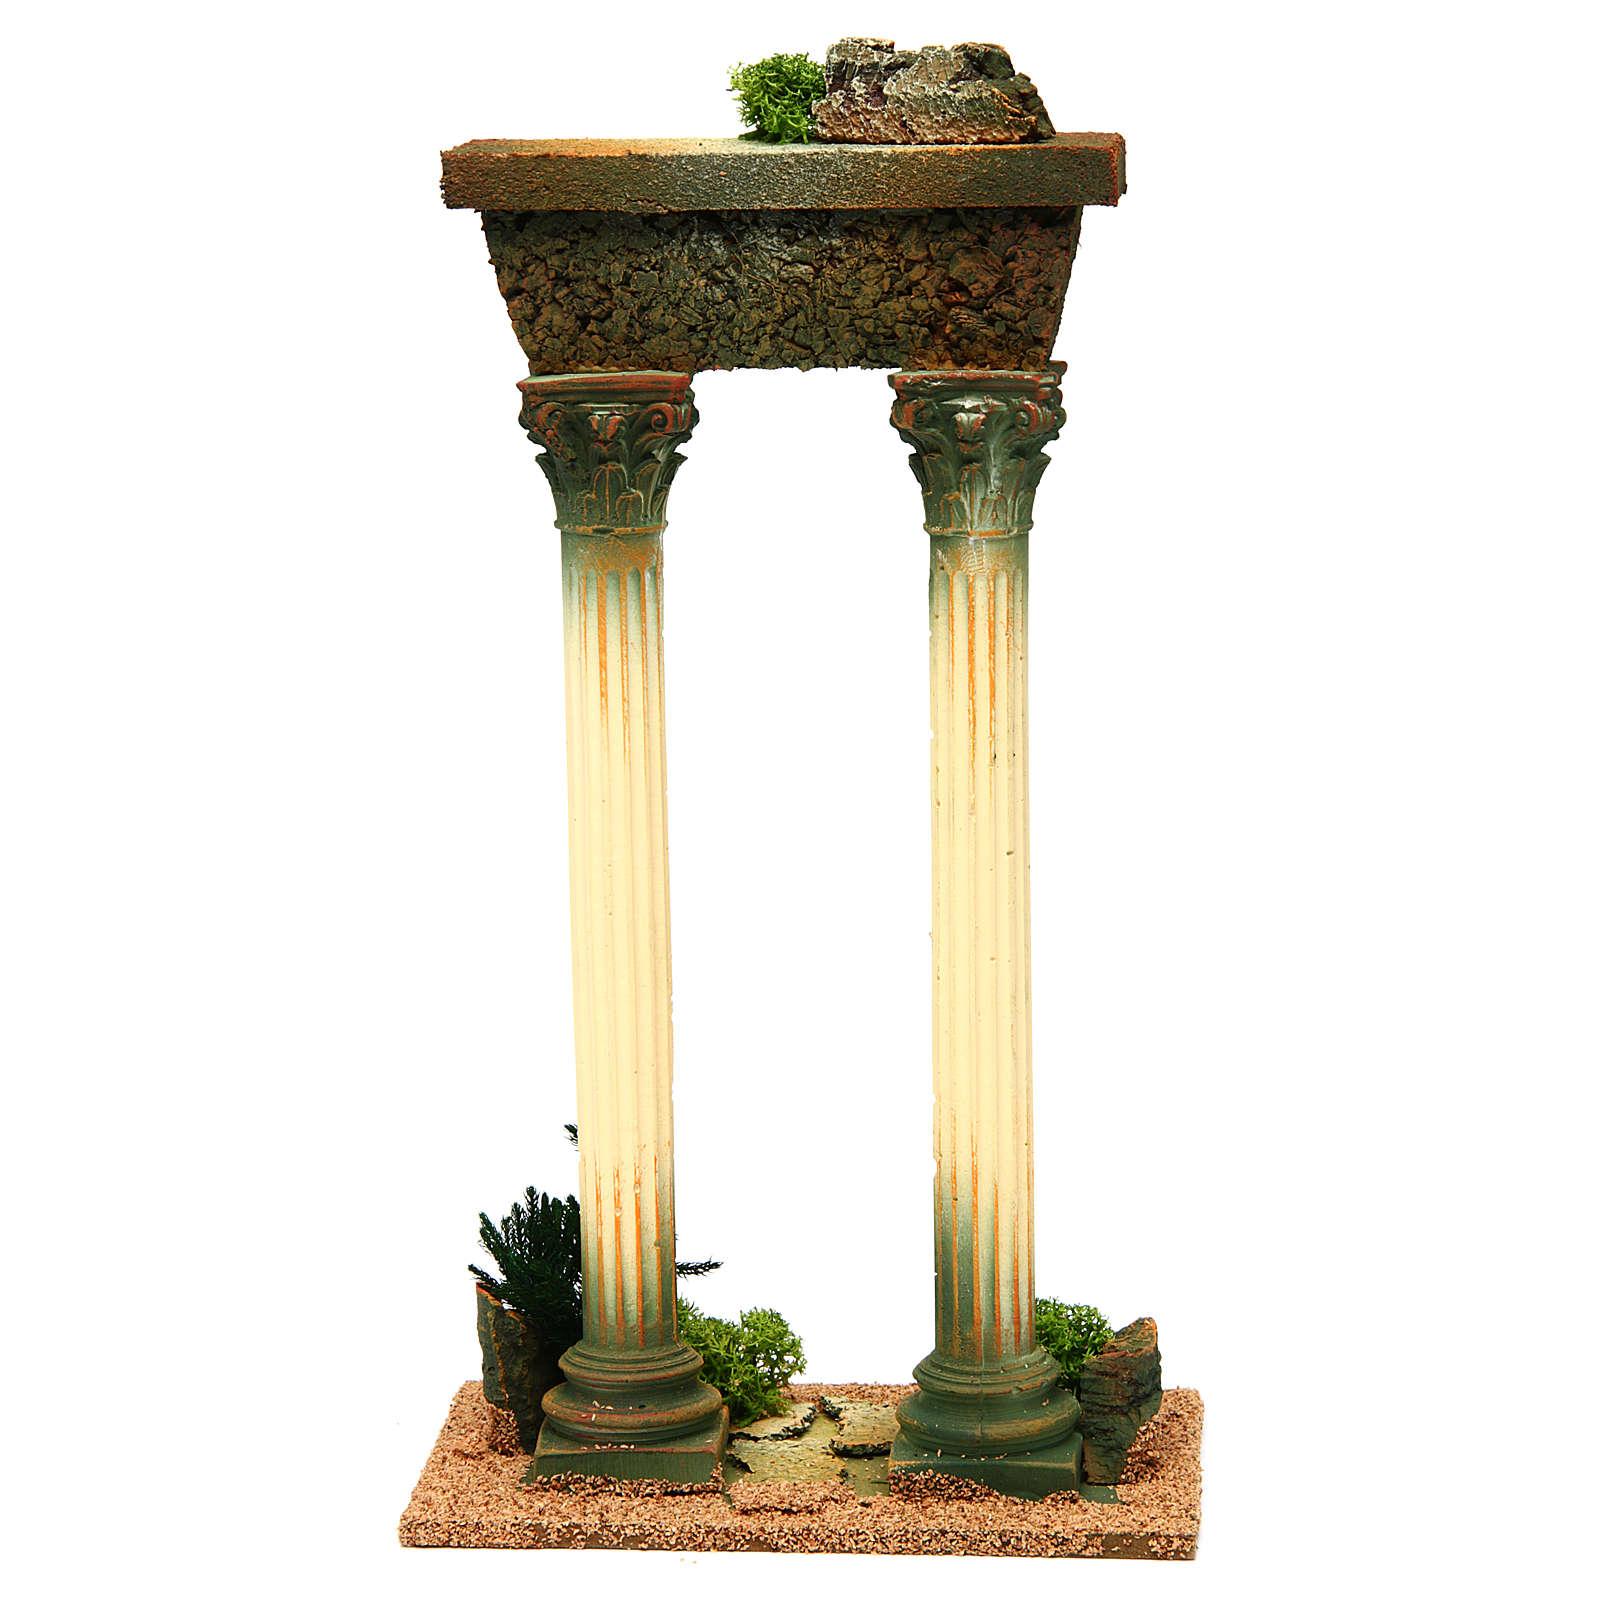 Roman pillars with ruins for Nativity scene 4